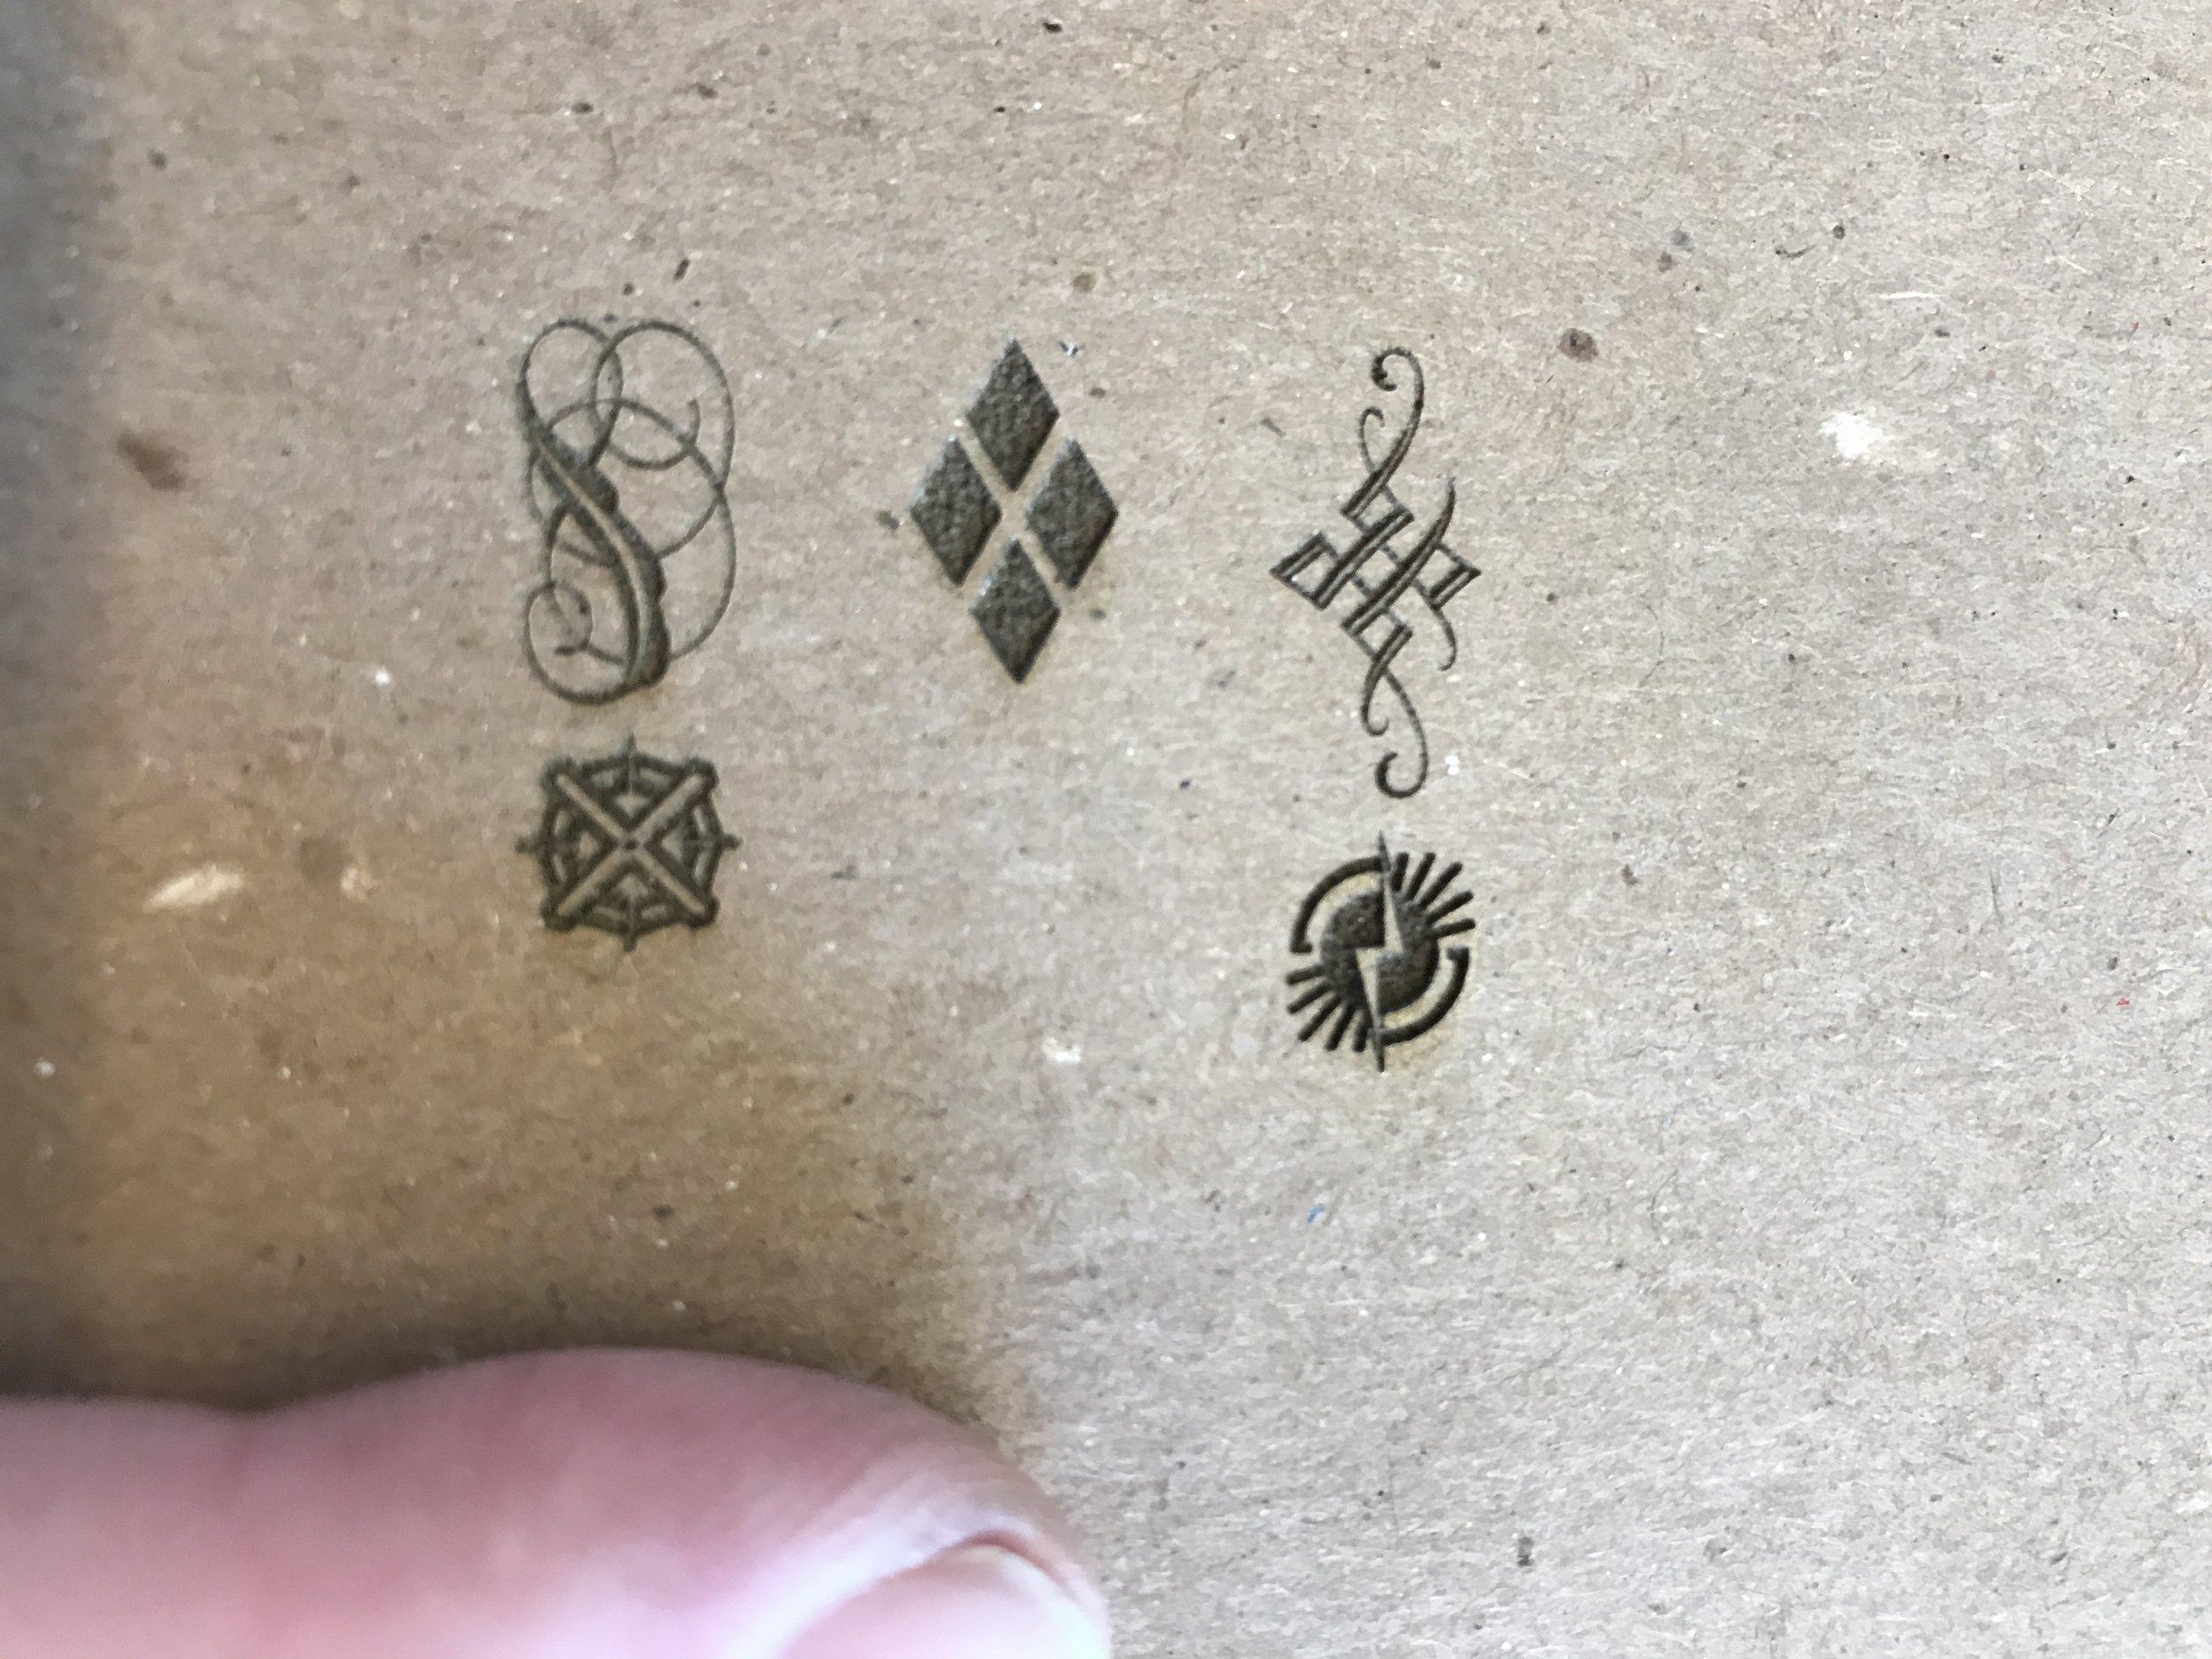 Davey board engraving